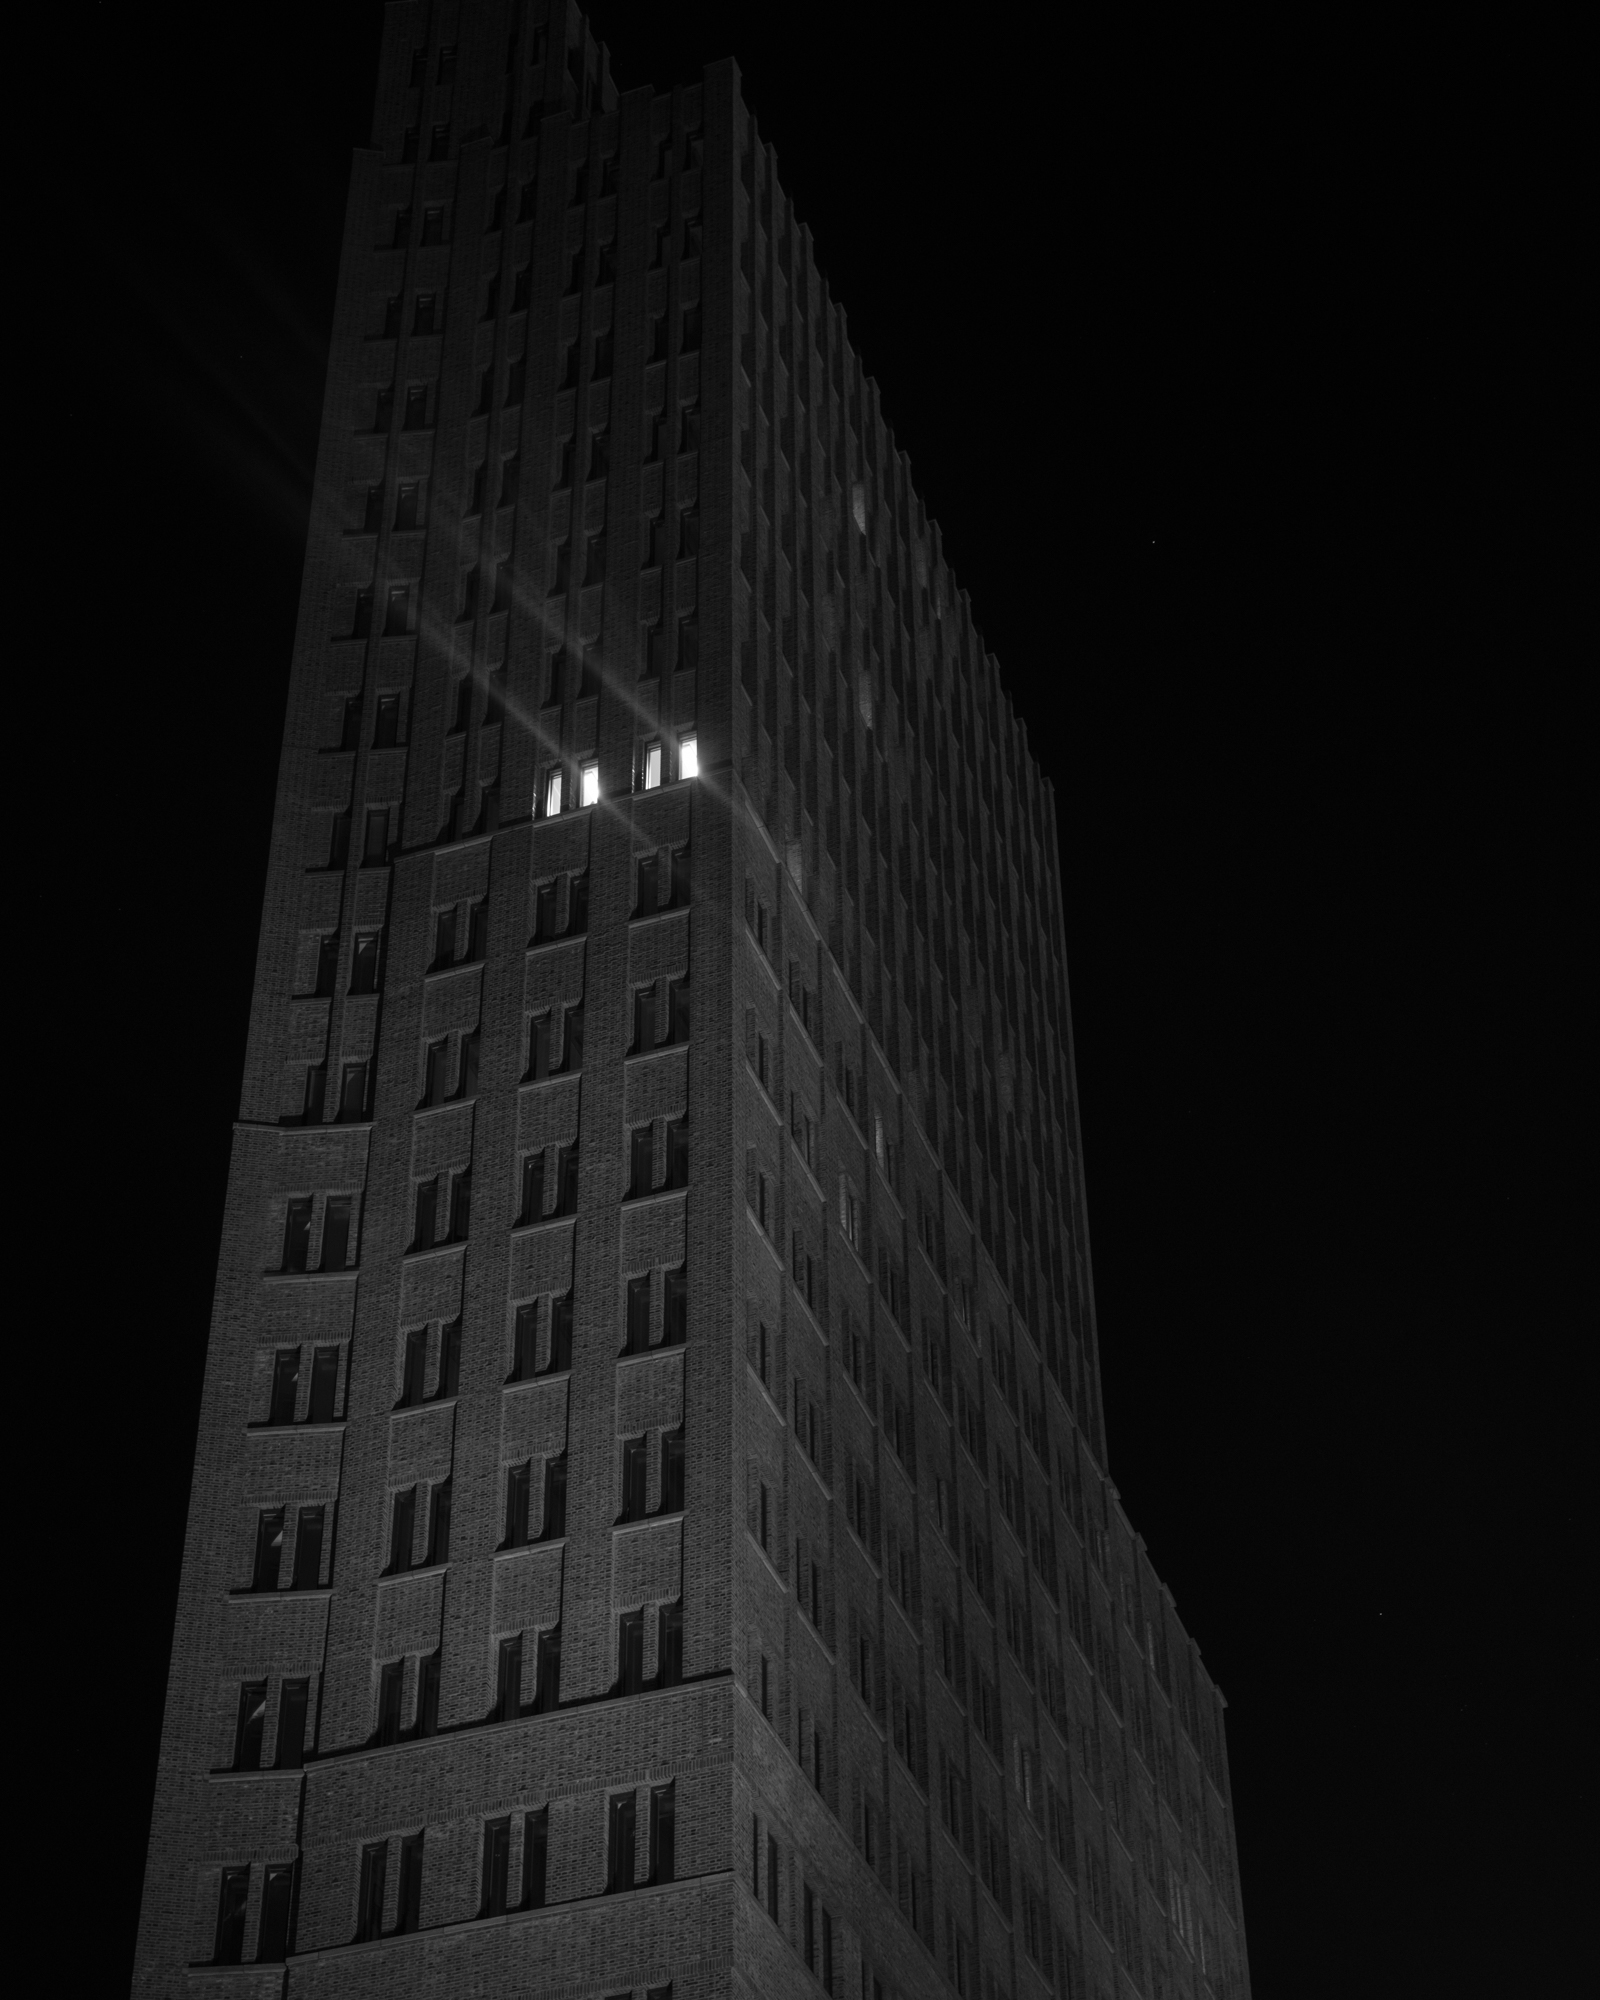 Building at Night